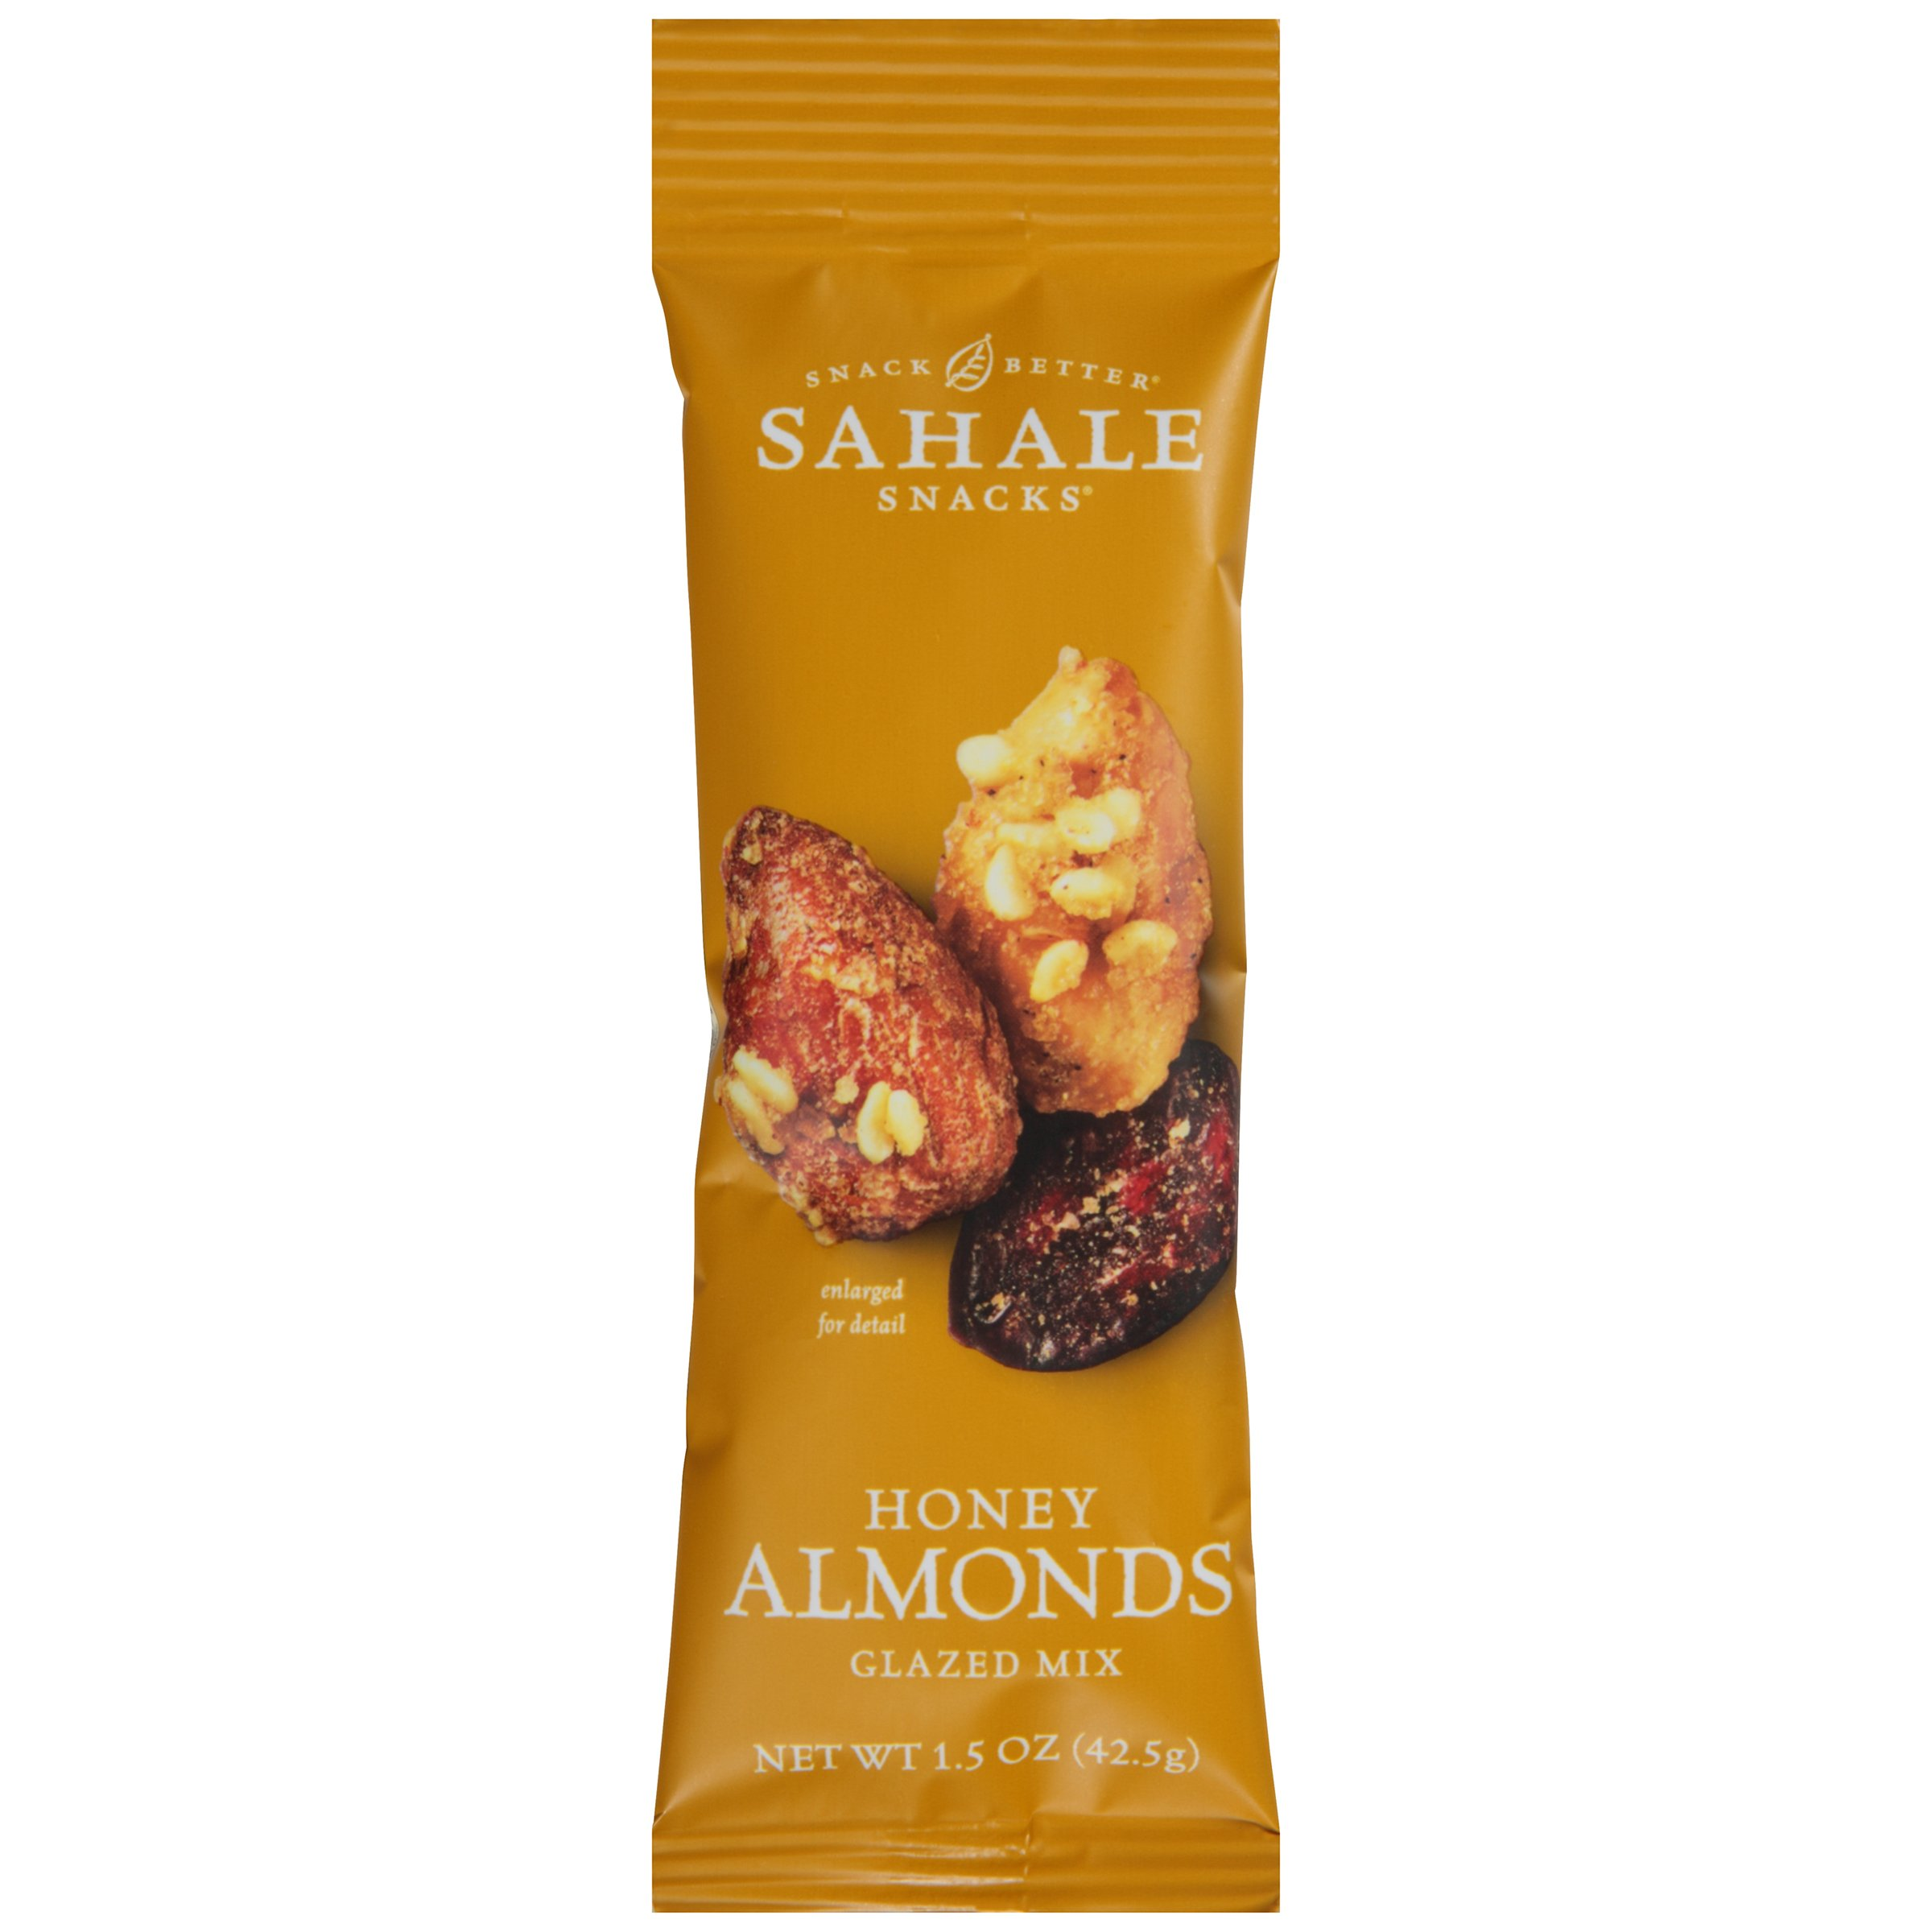 Sahale 1.5 oz. Almond Honey Caddy 9 pack (12 count)